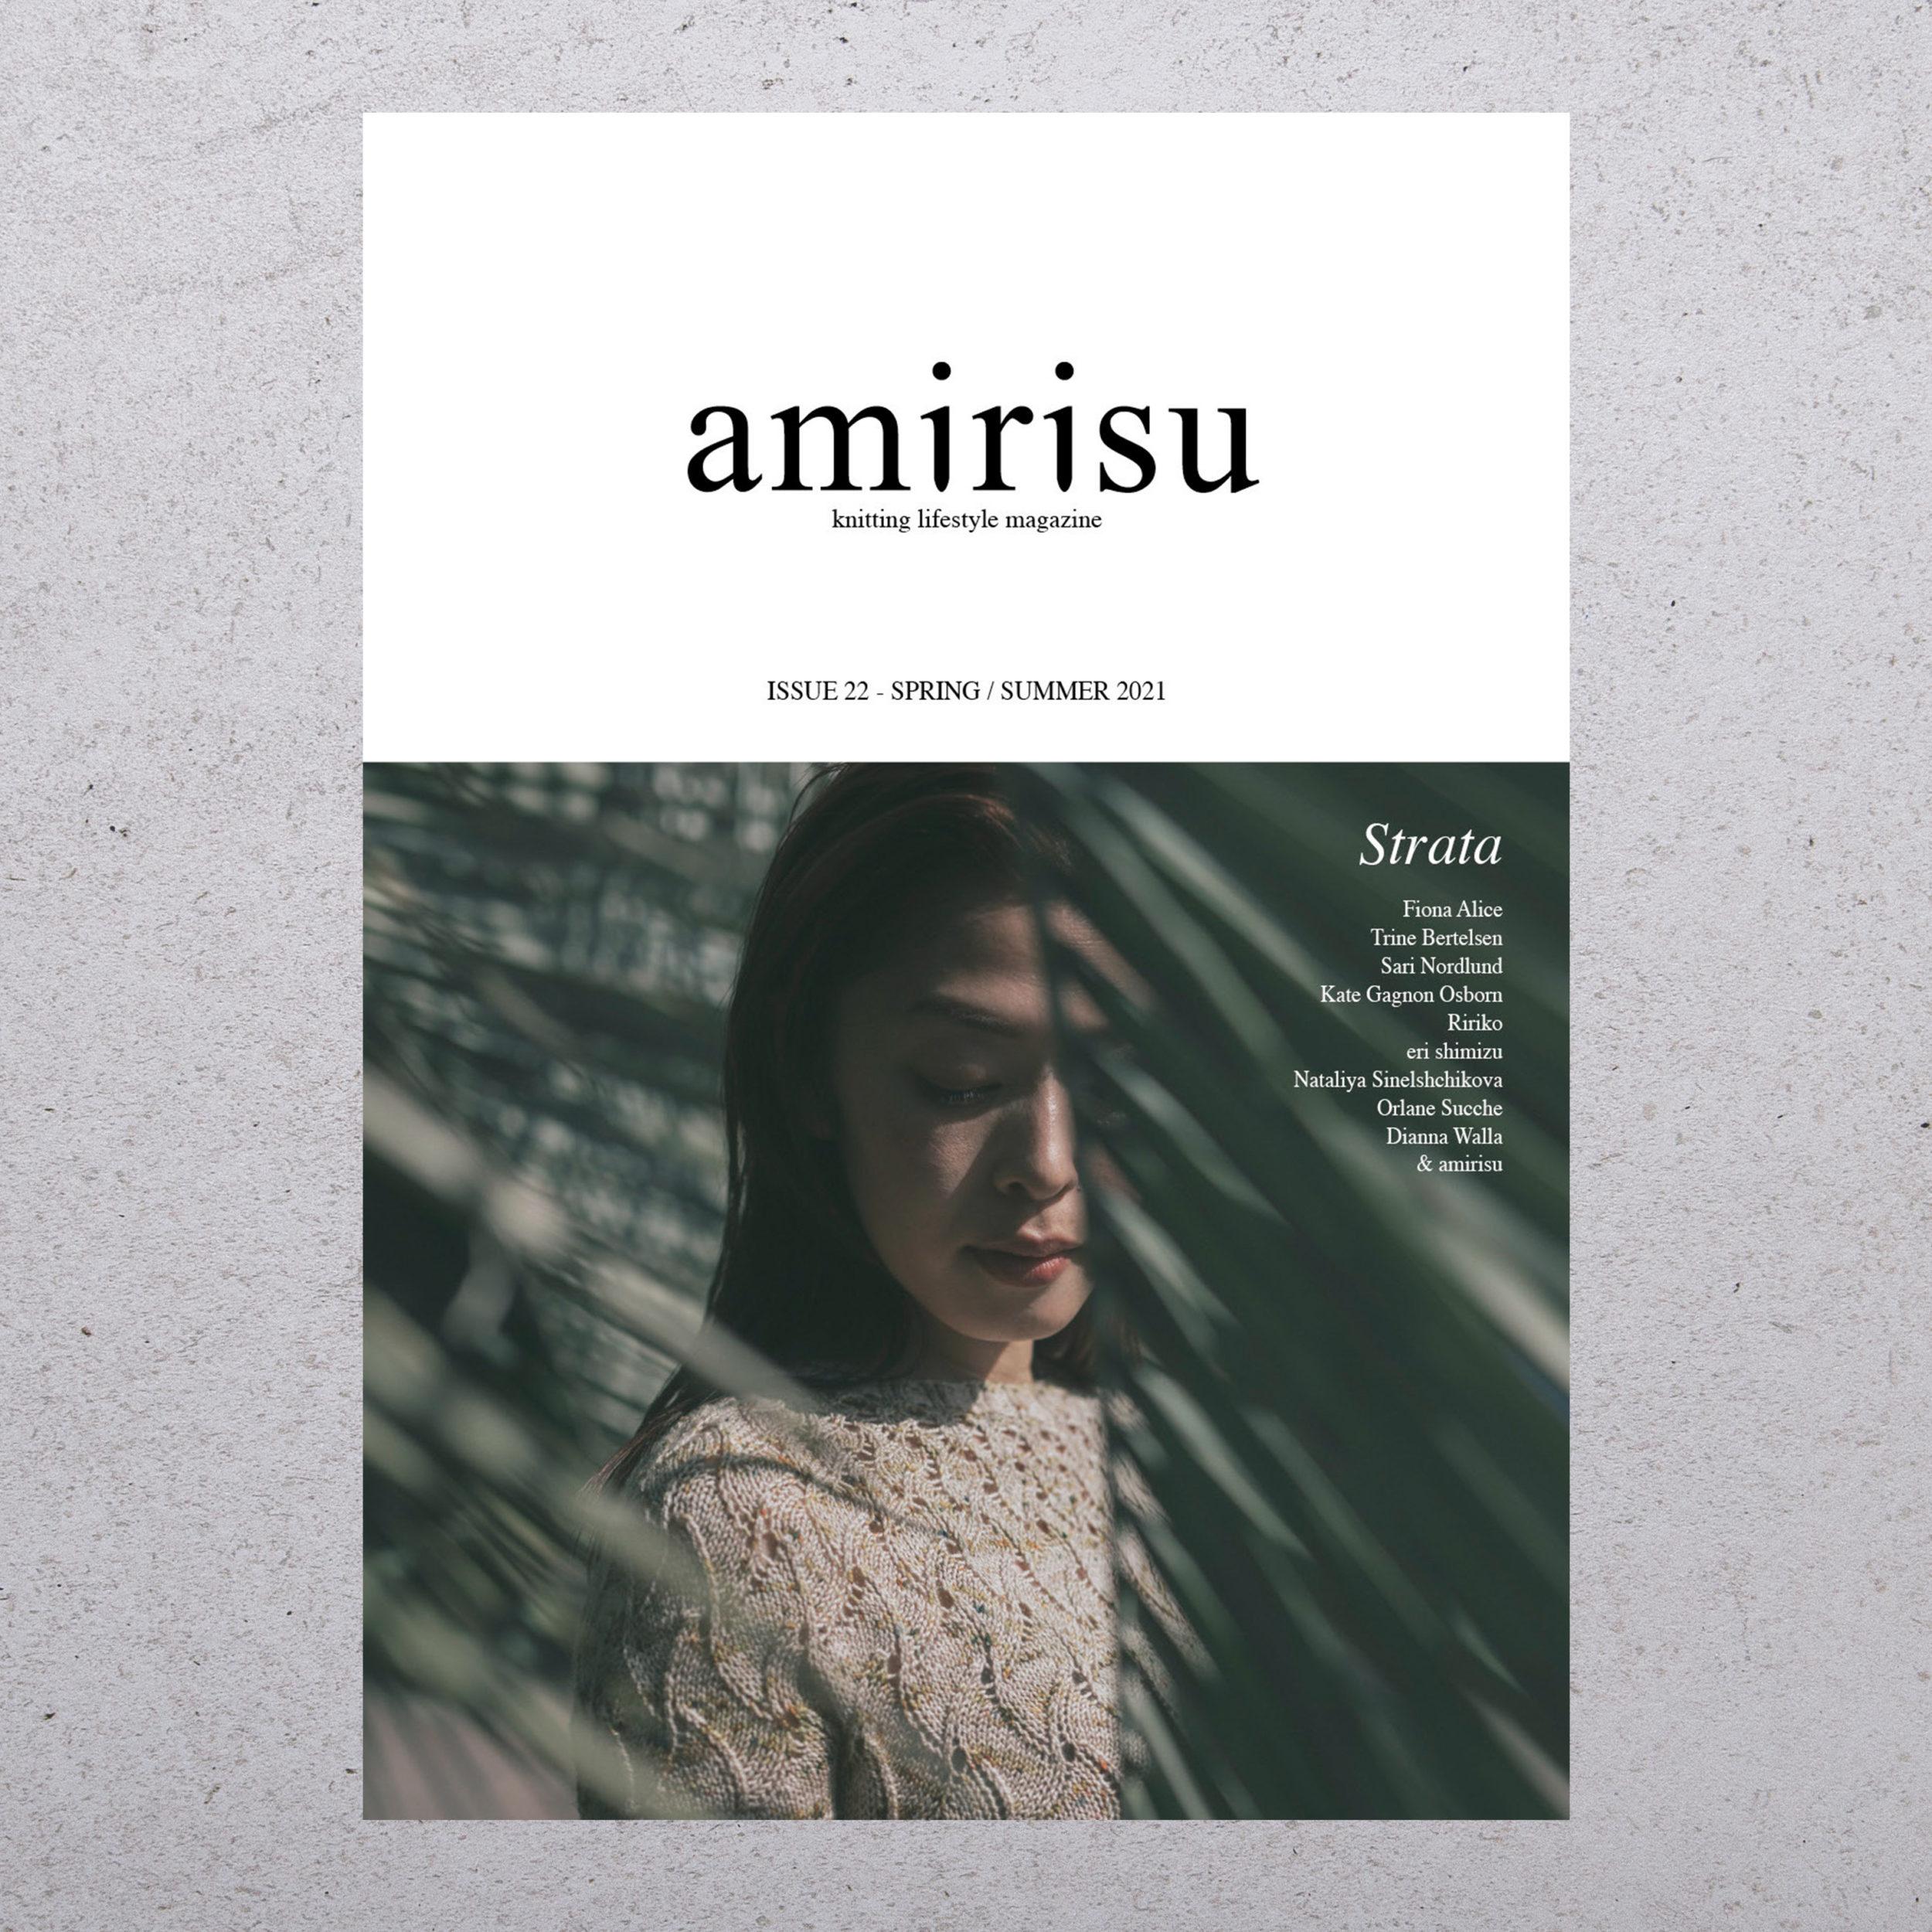 AMIRISU ISSUE 22 - AMIRISU